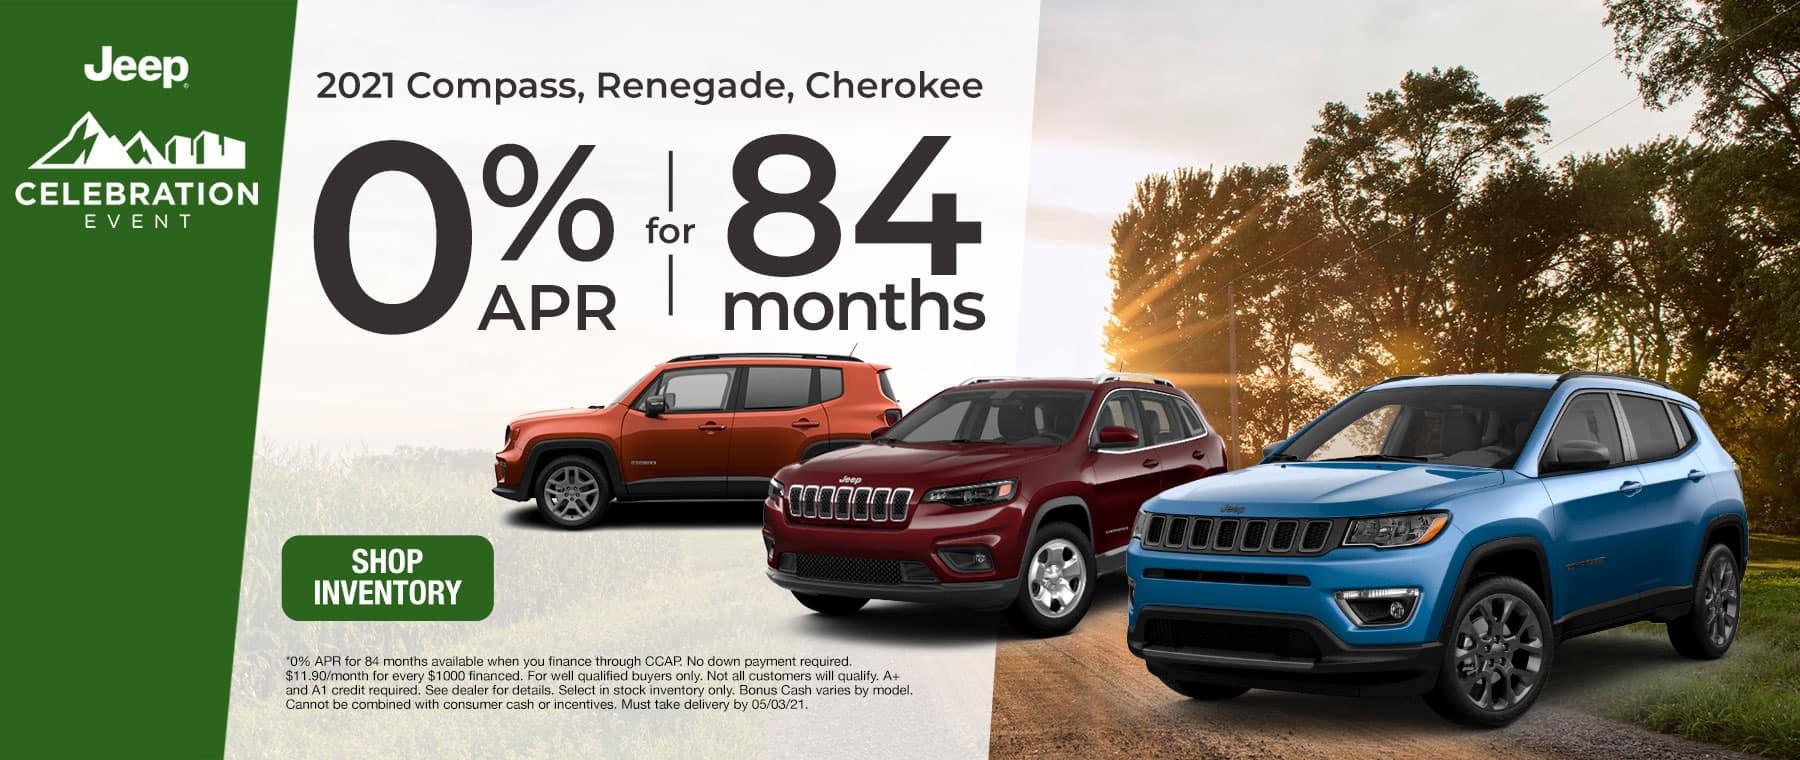 2021 Compass, Renegade, Cherokee - 0% APR for 84 Months